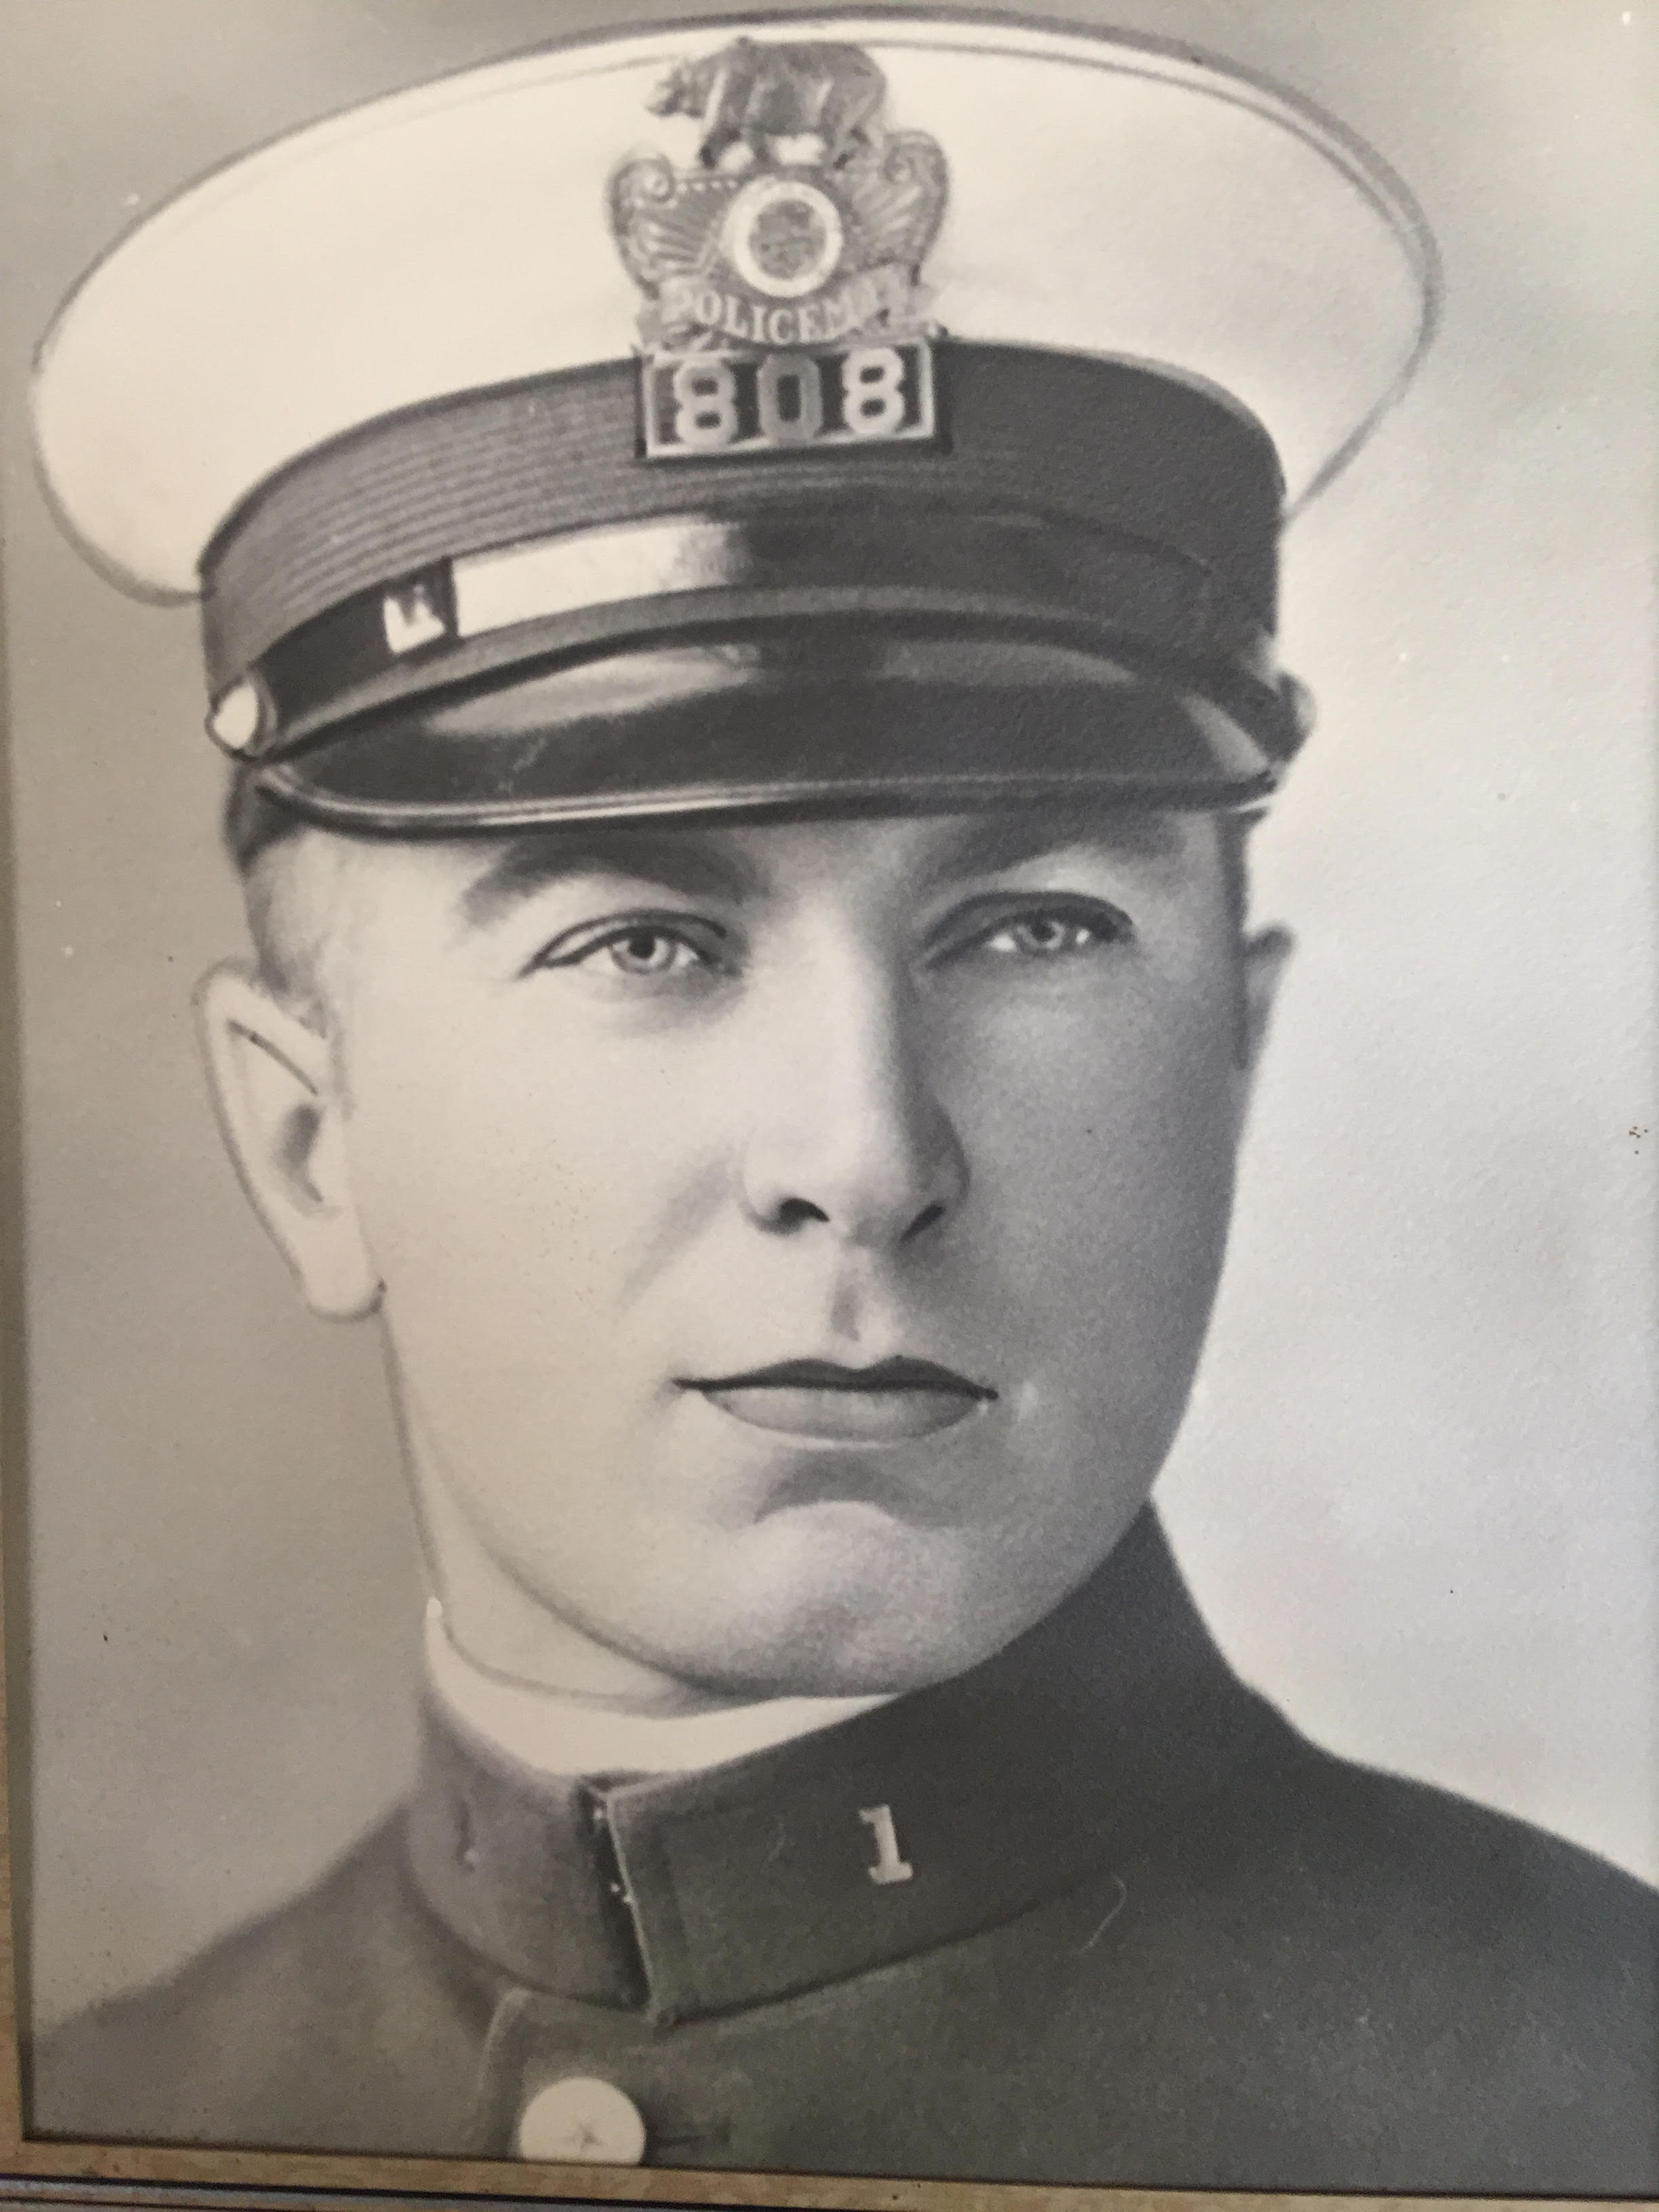 Policeman Earl John Bickel | Los Angeles Police Department, California